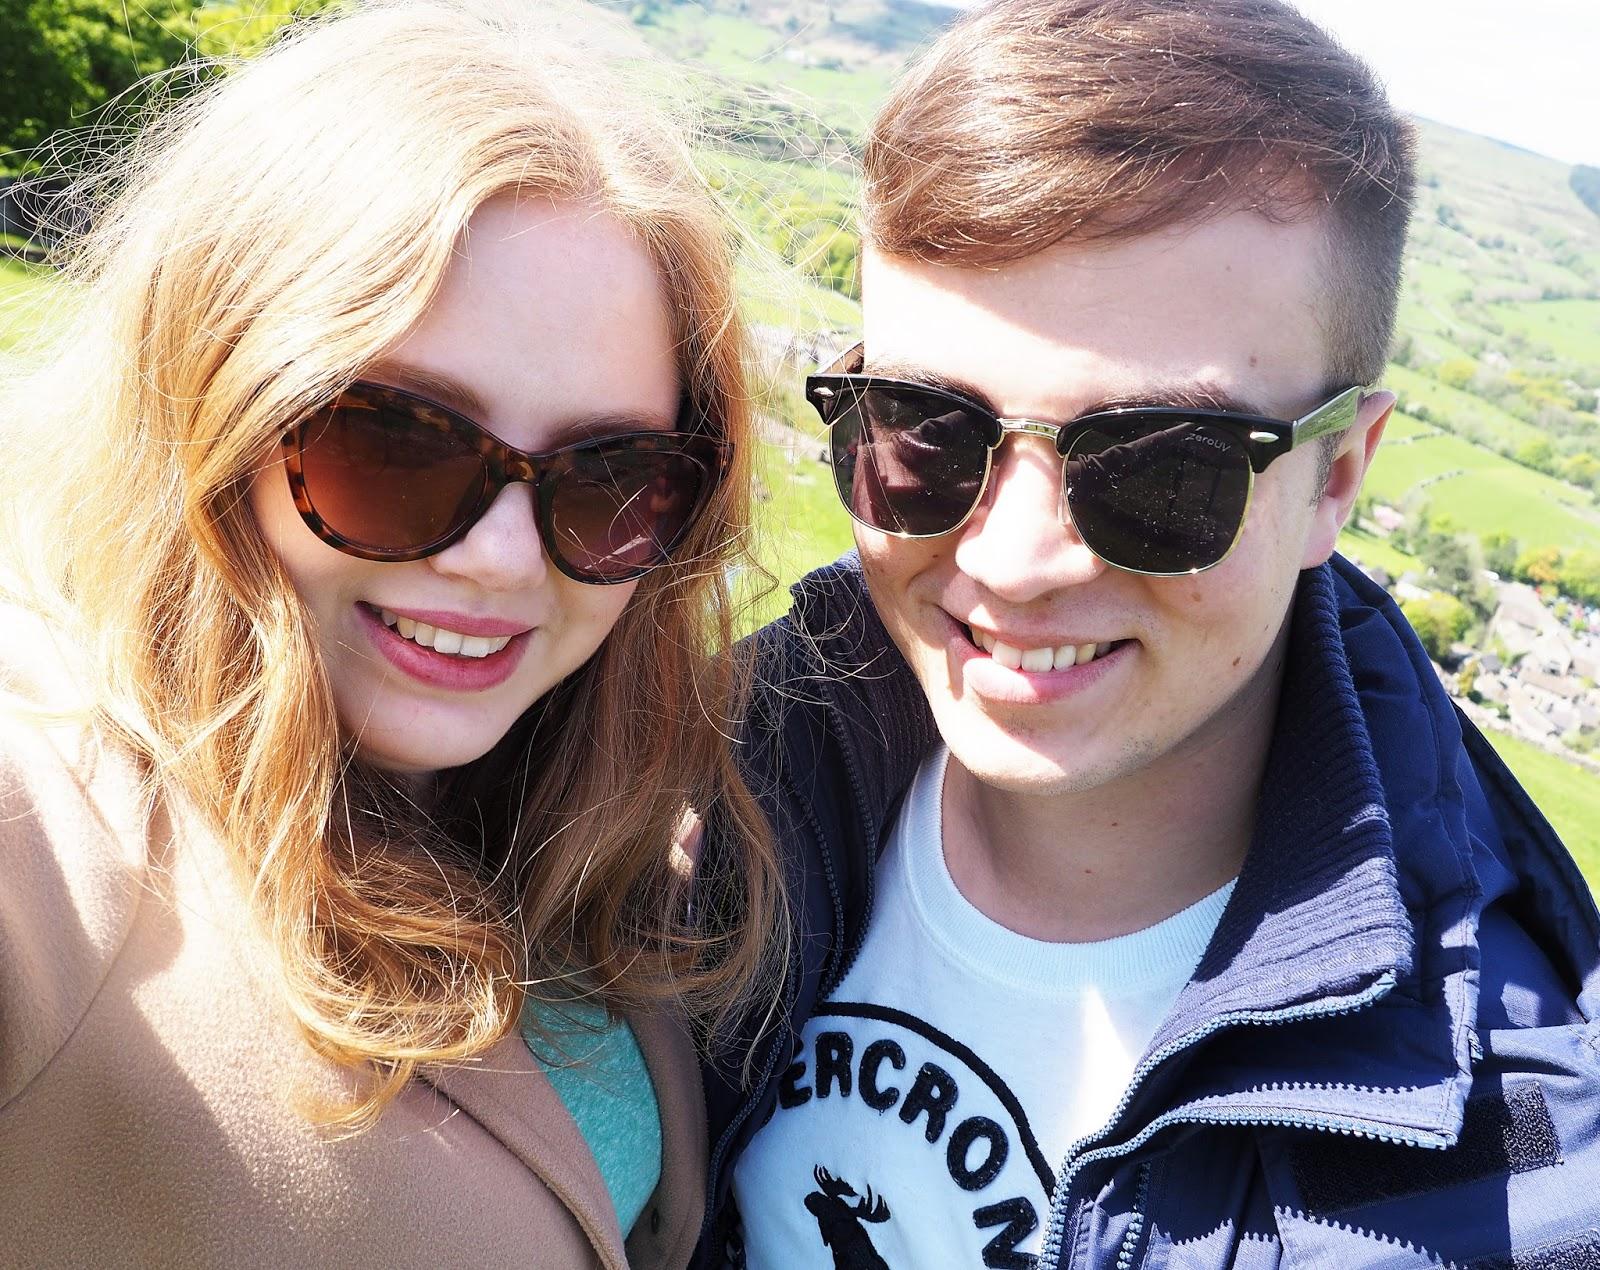 A Tinder Success Happy Relationship